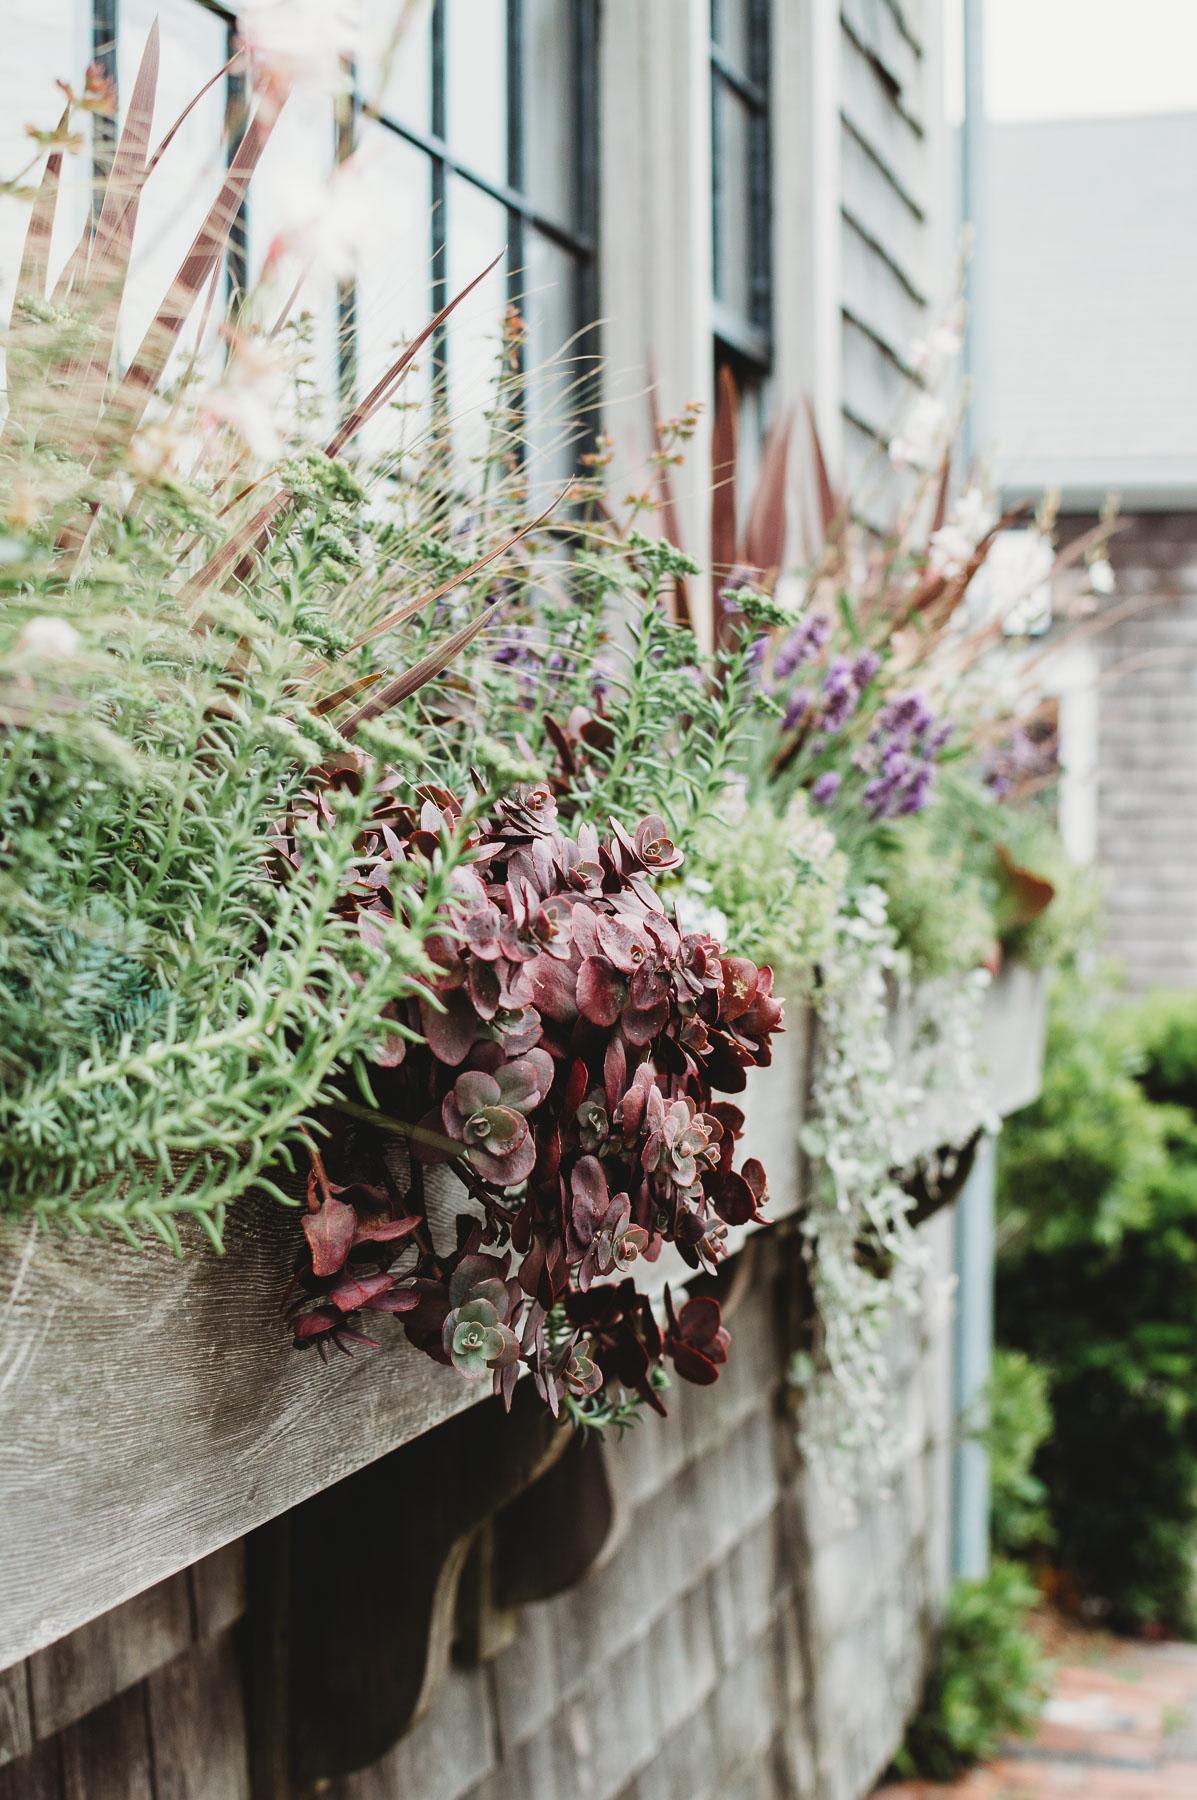 Downtown Nantucket Flower Box | Nicole Victory Design